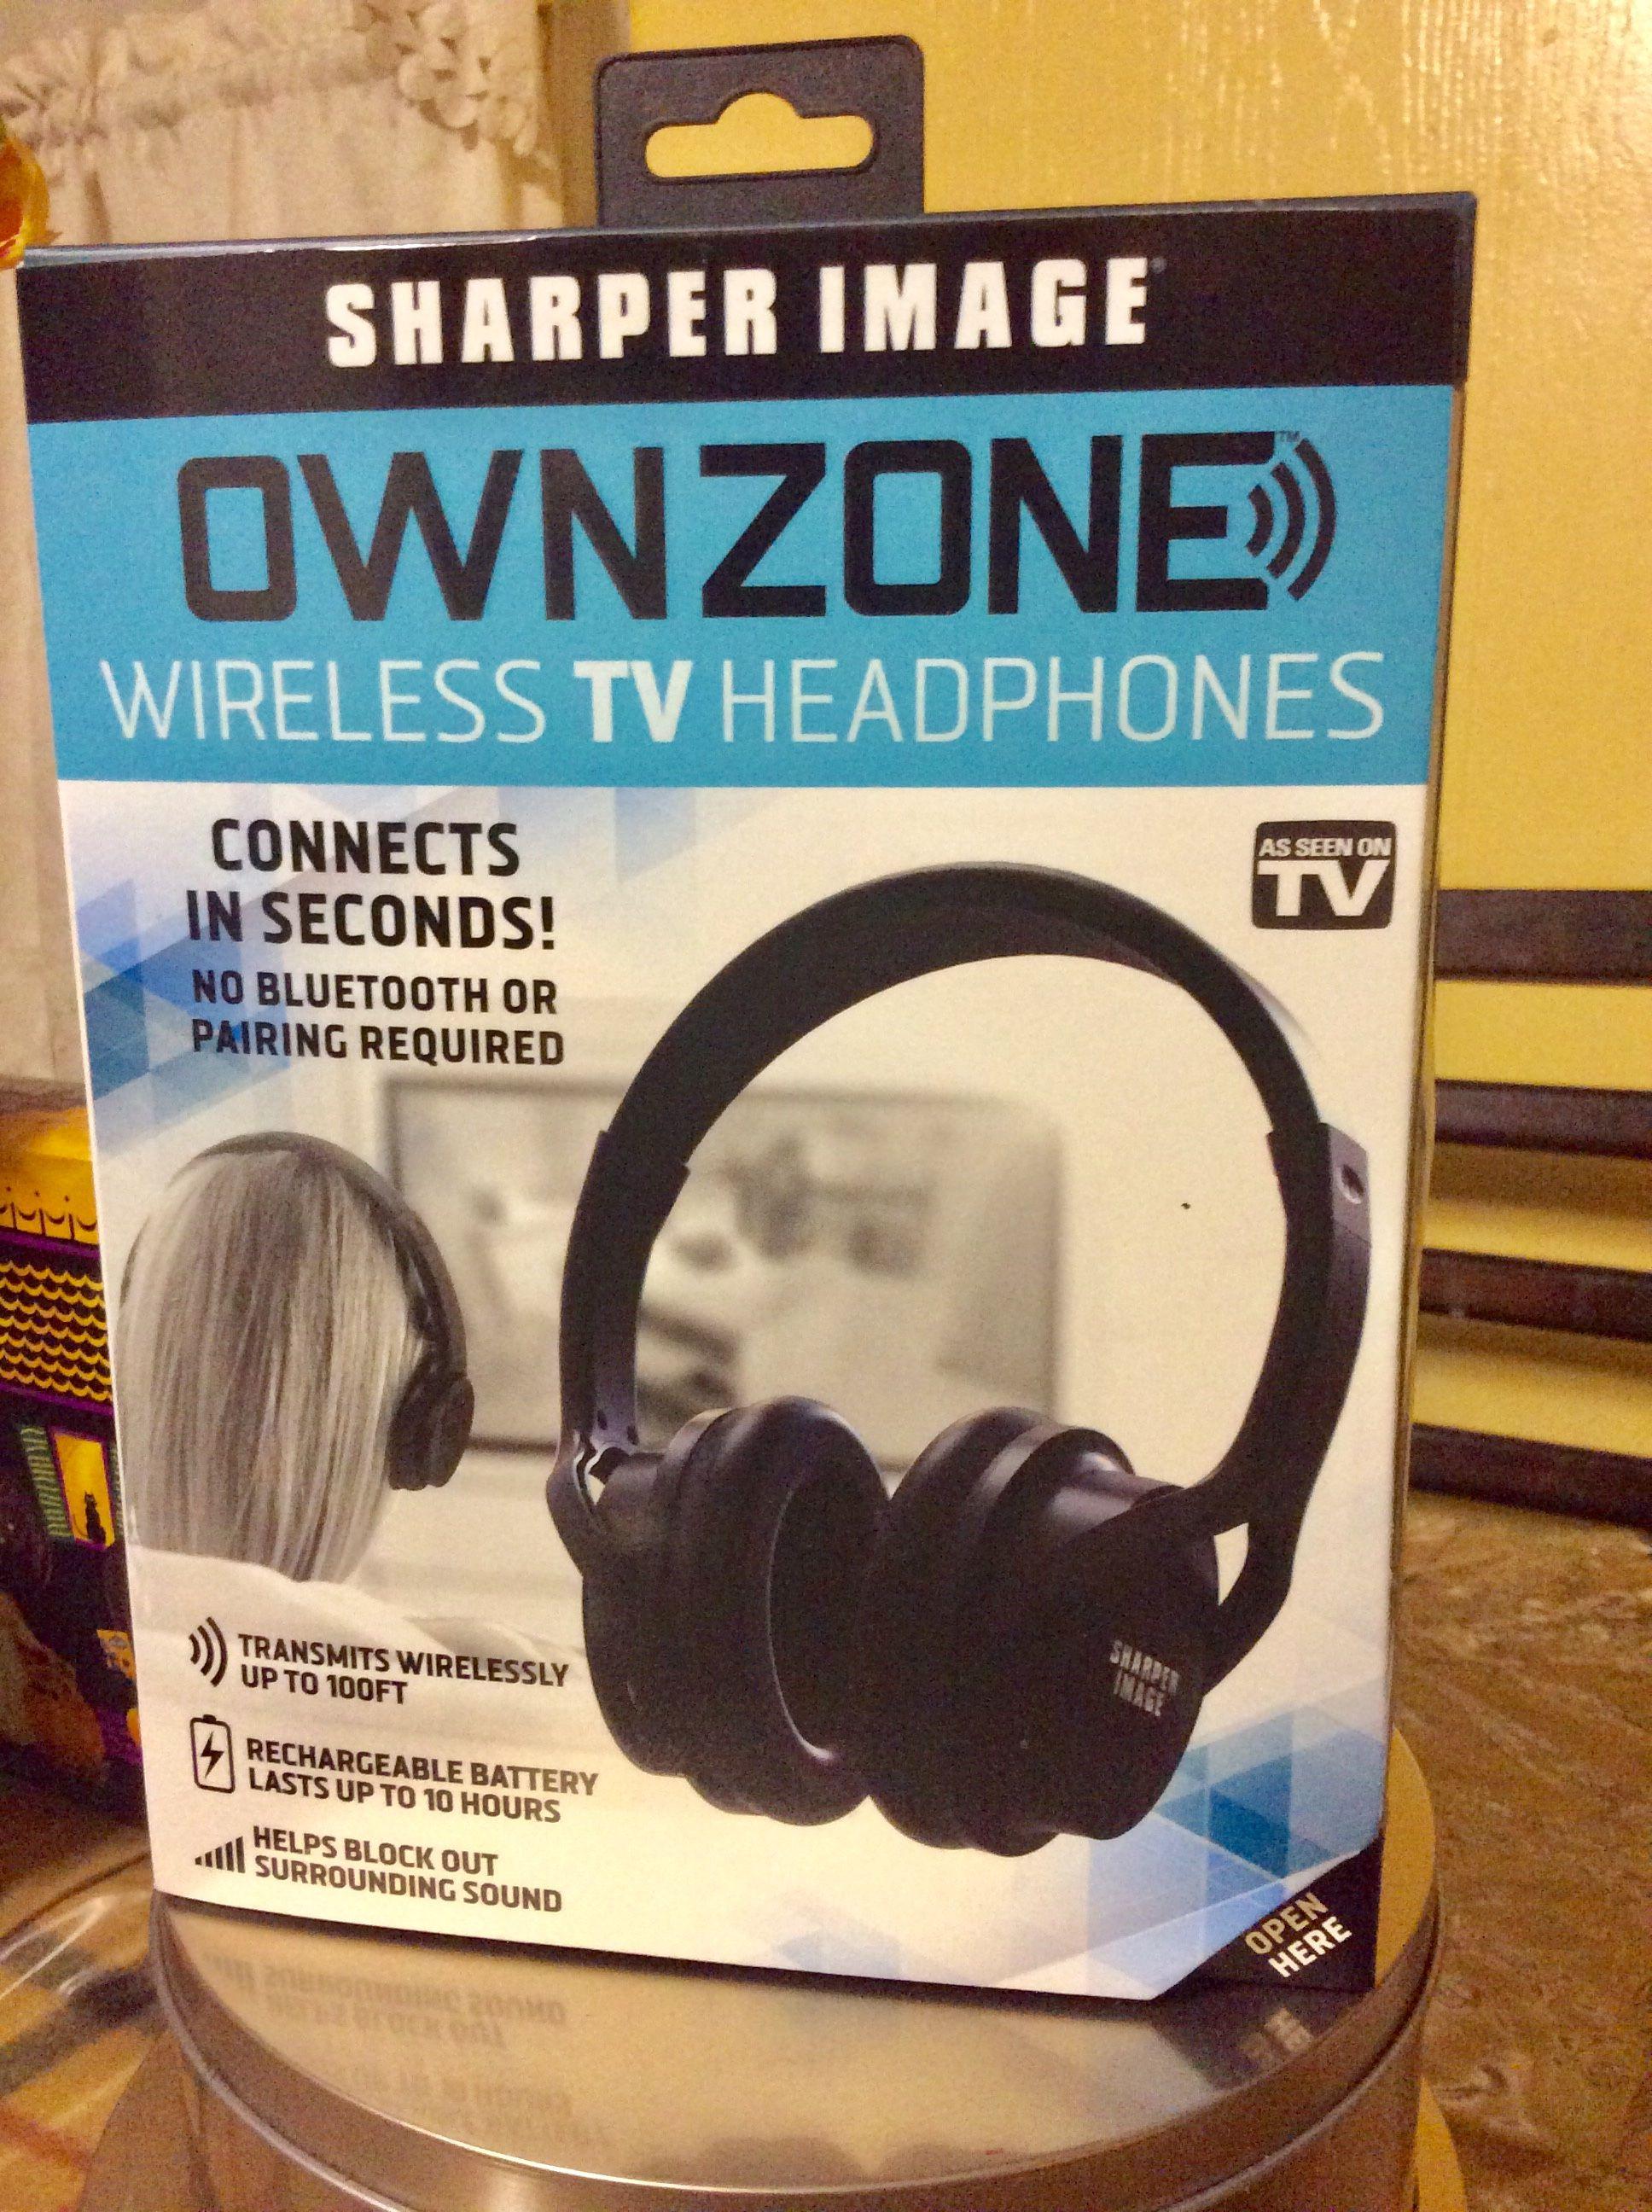 Sharper Image Ownzone Wireless Tv Headphones Priscilla De Leon